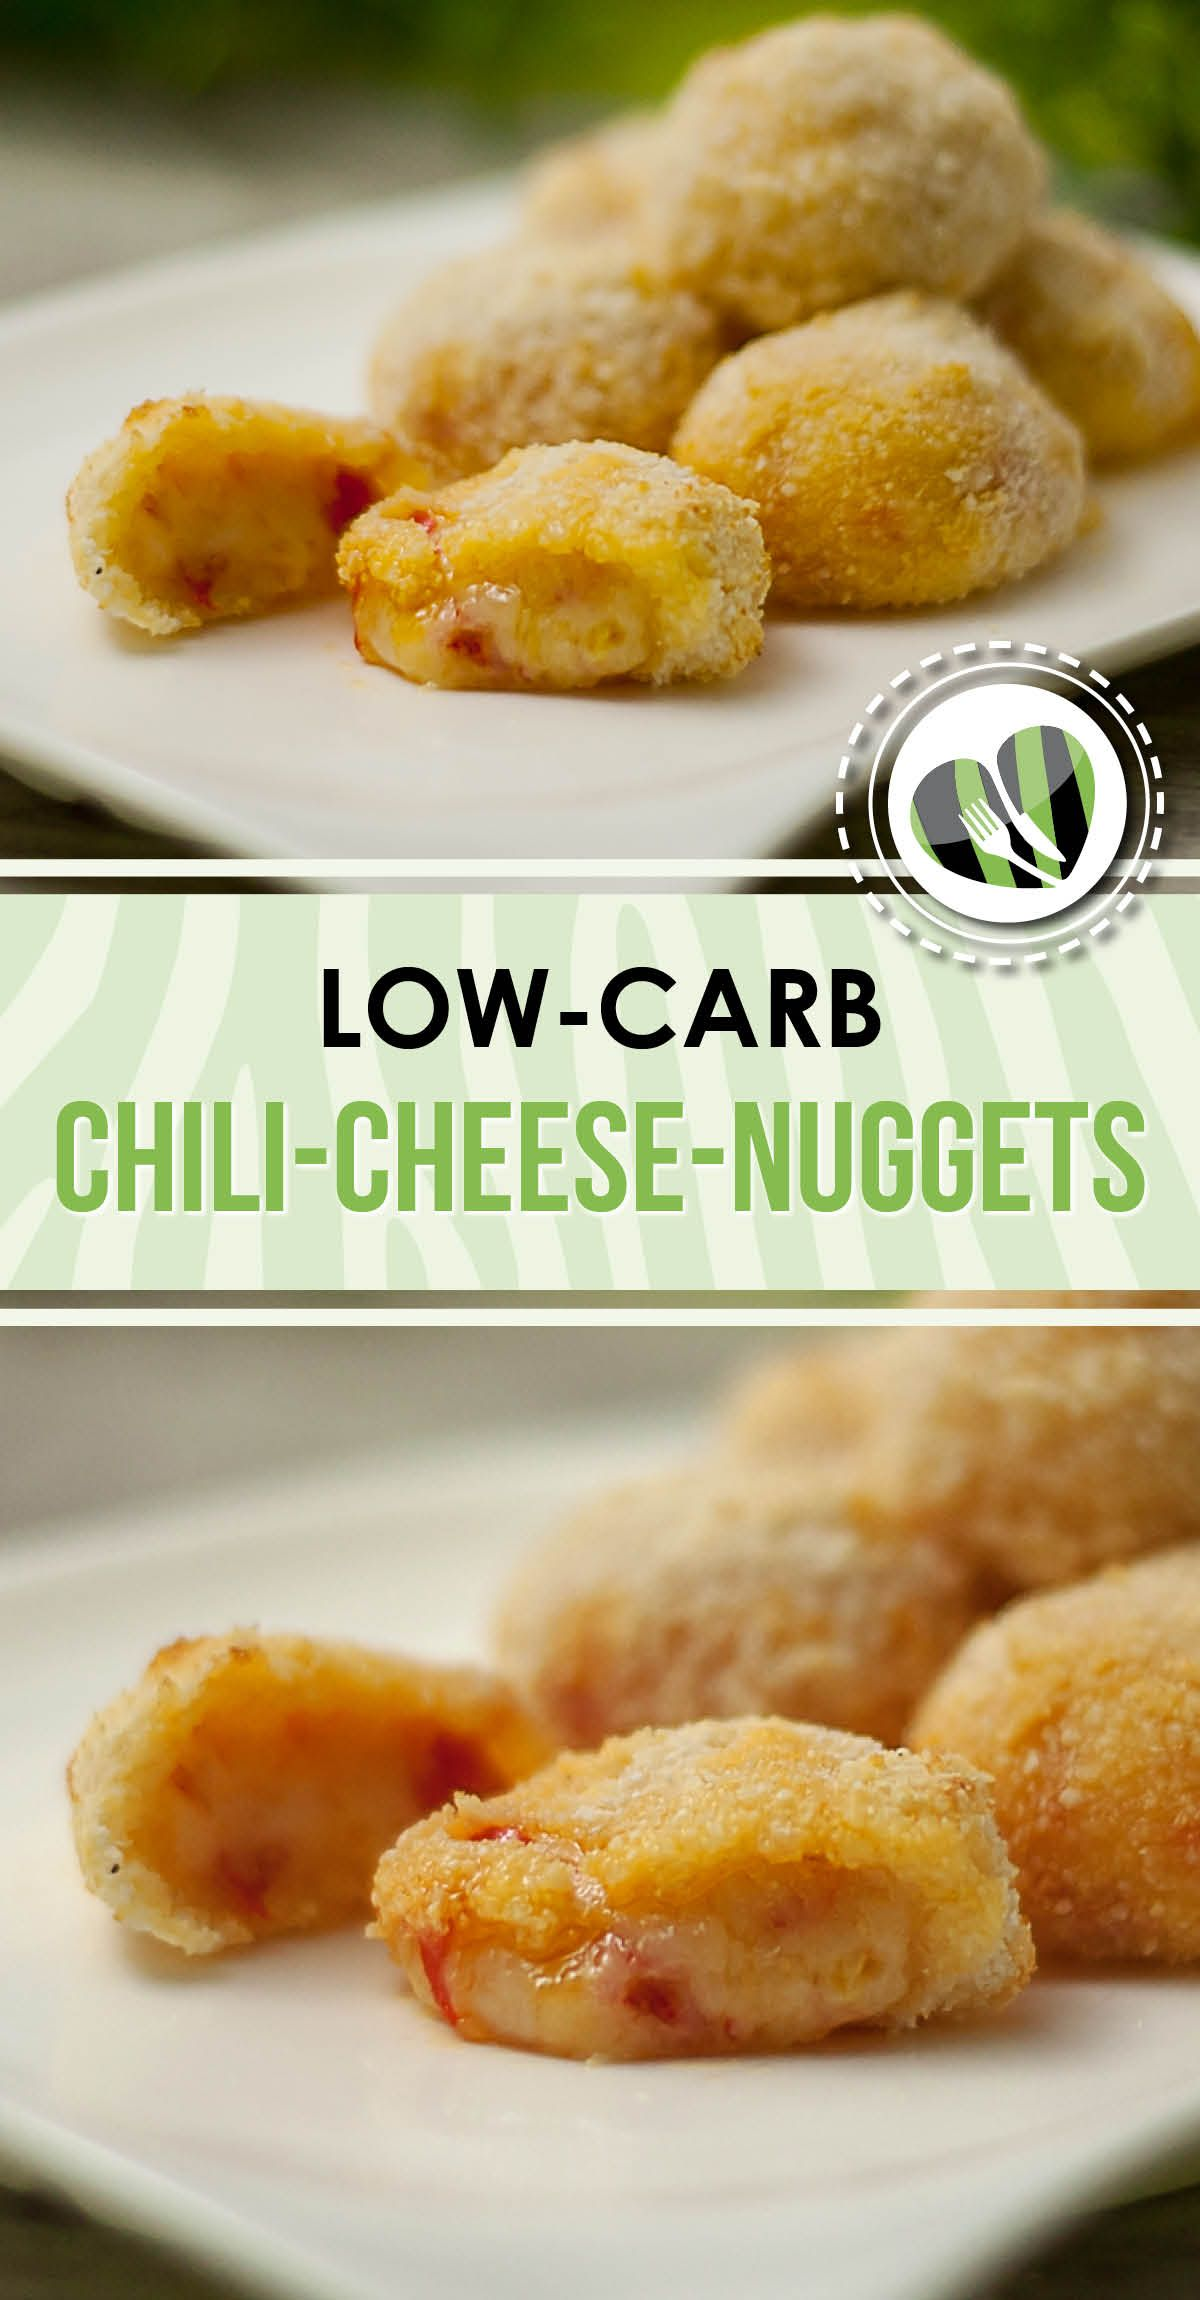 Chili-Cheese-Nuggets #lowcarbveggies